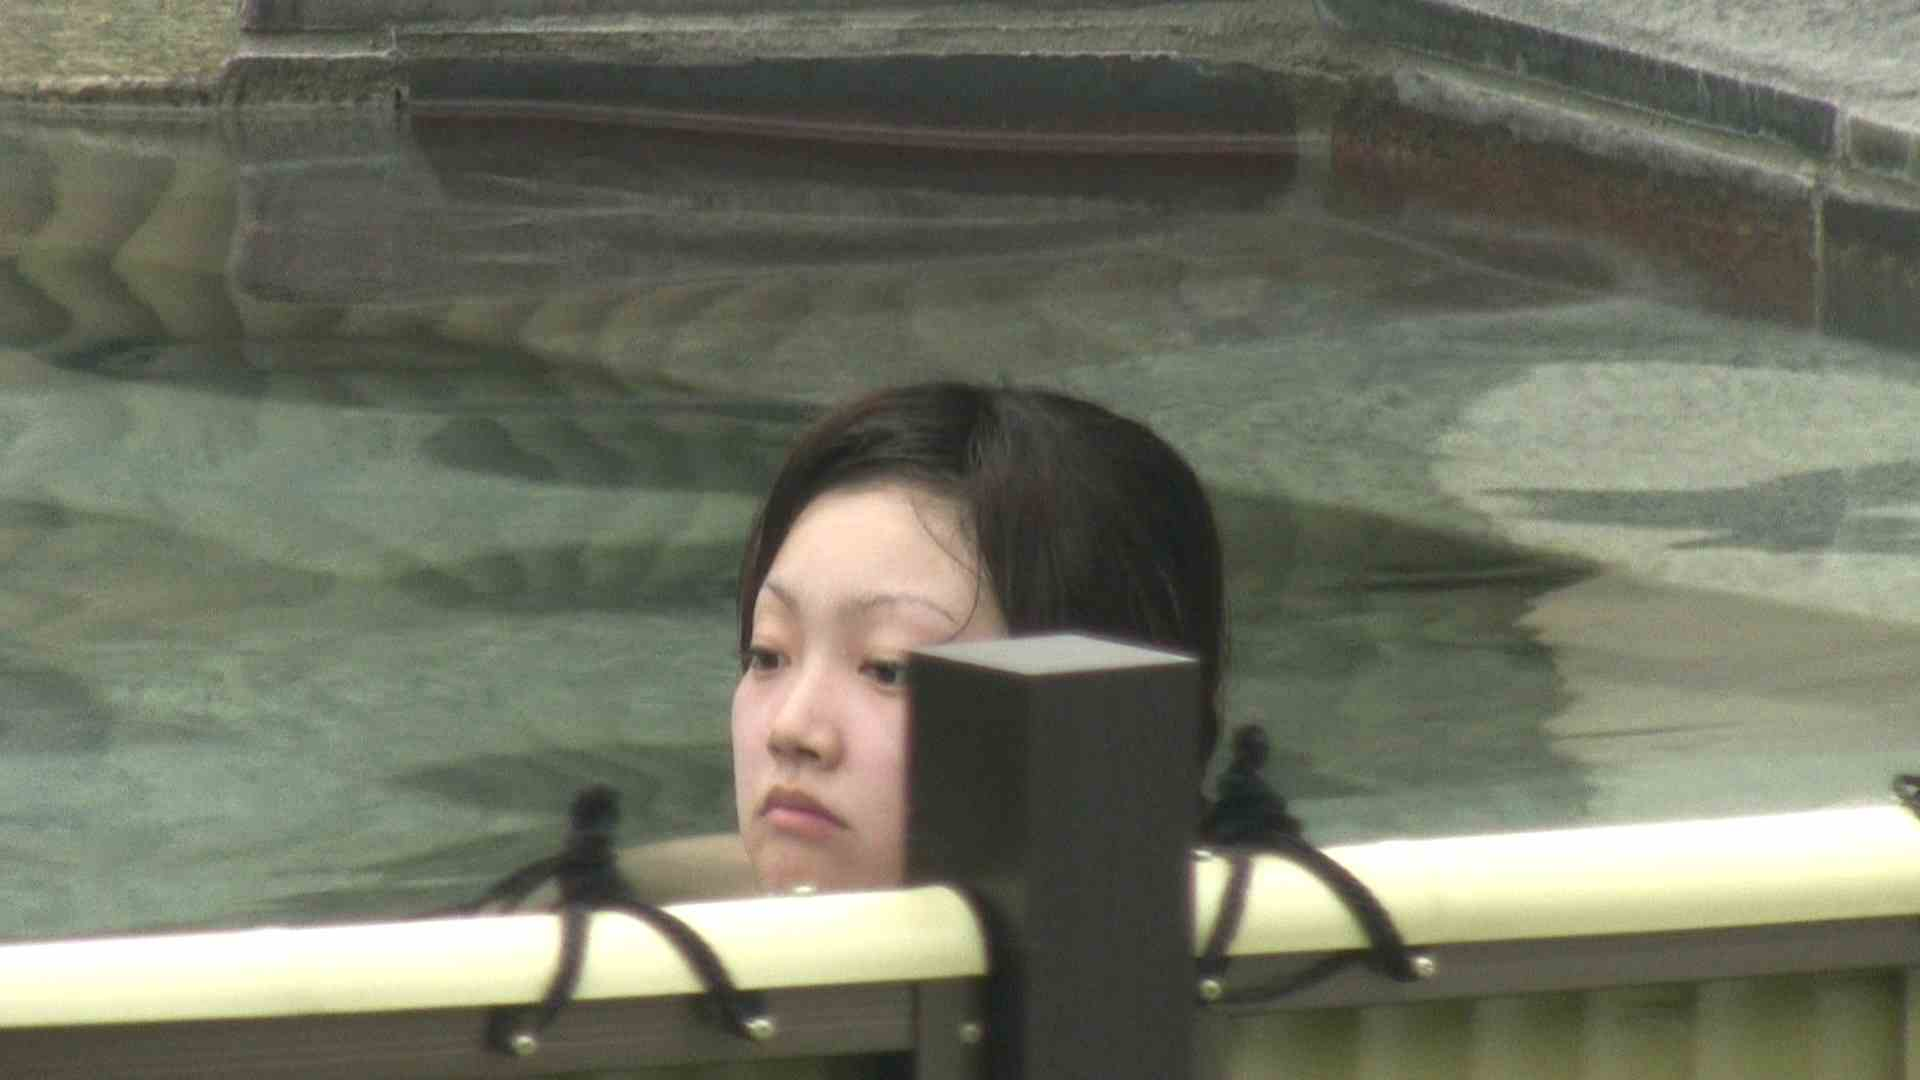 Aquaな露天風呂Vol.126 盗撮シリーズ | 露天風呂編  103PIX 31